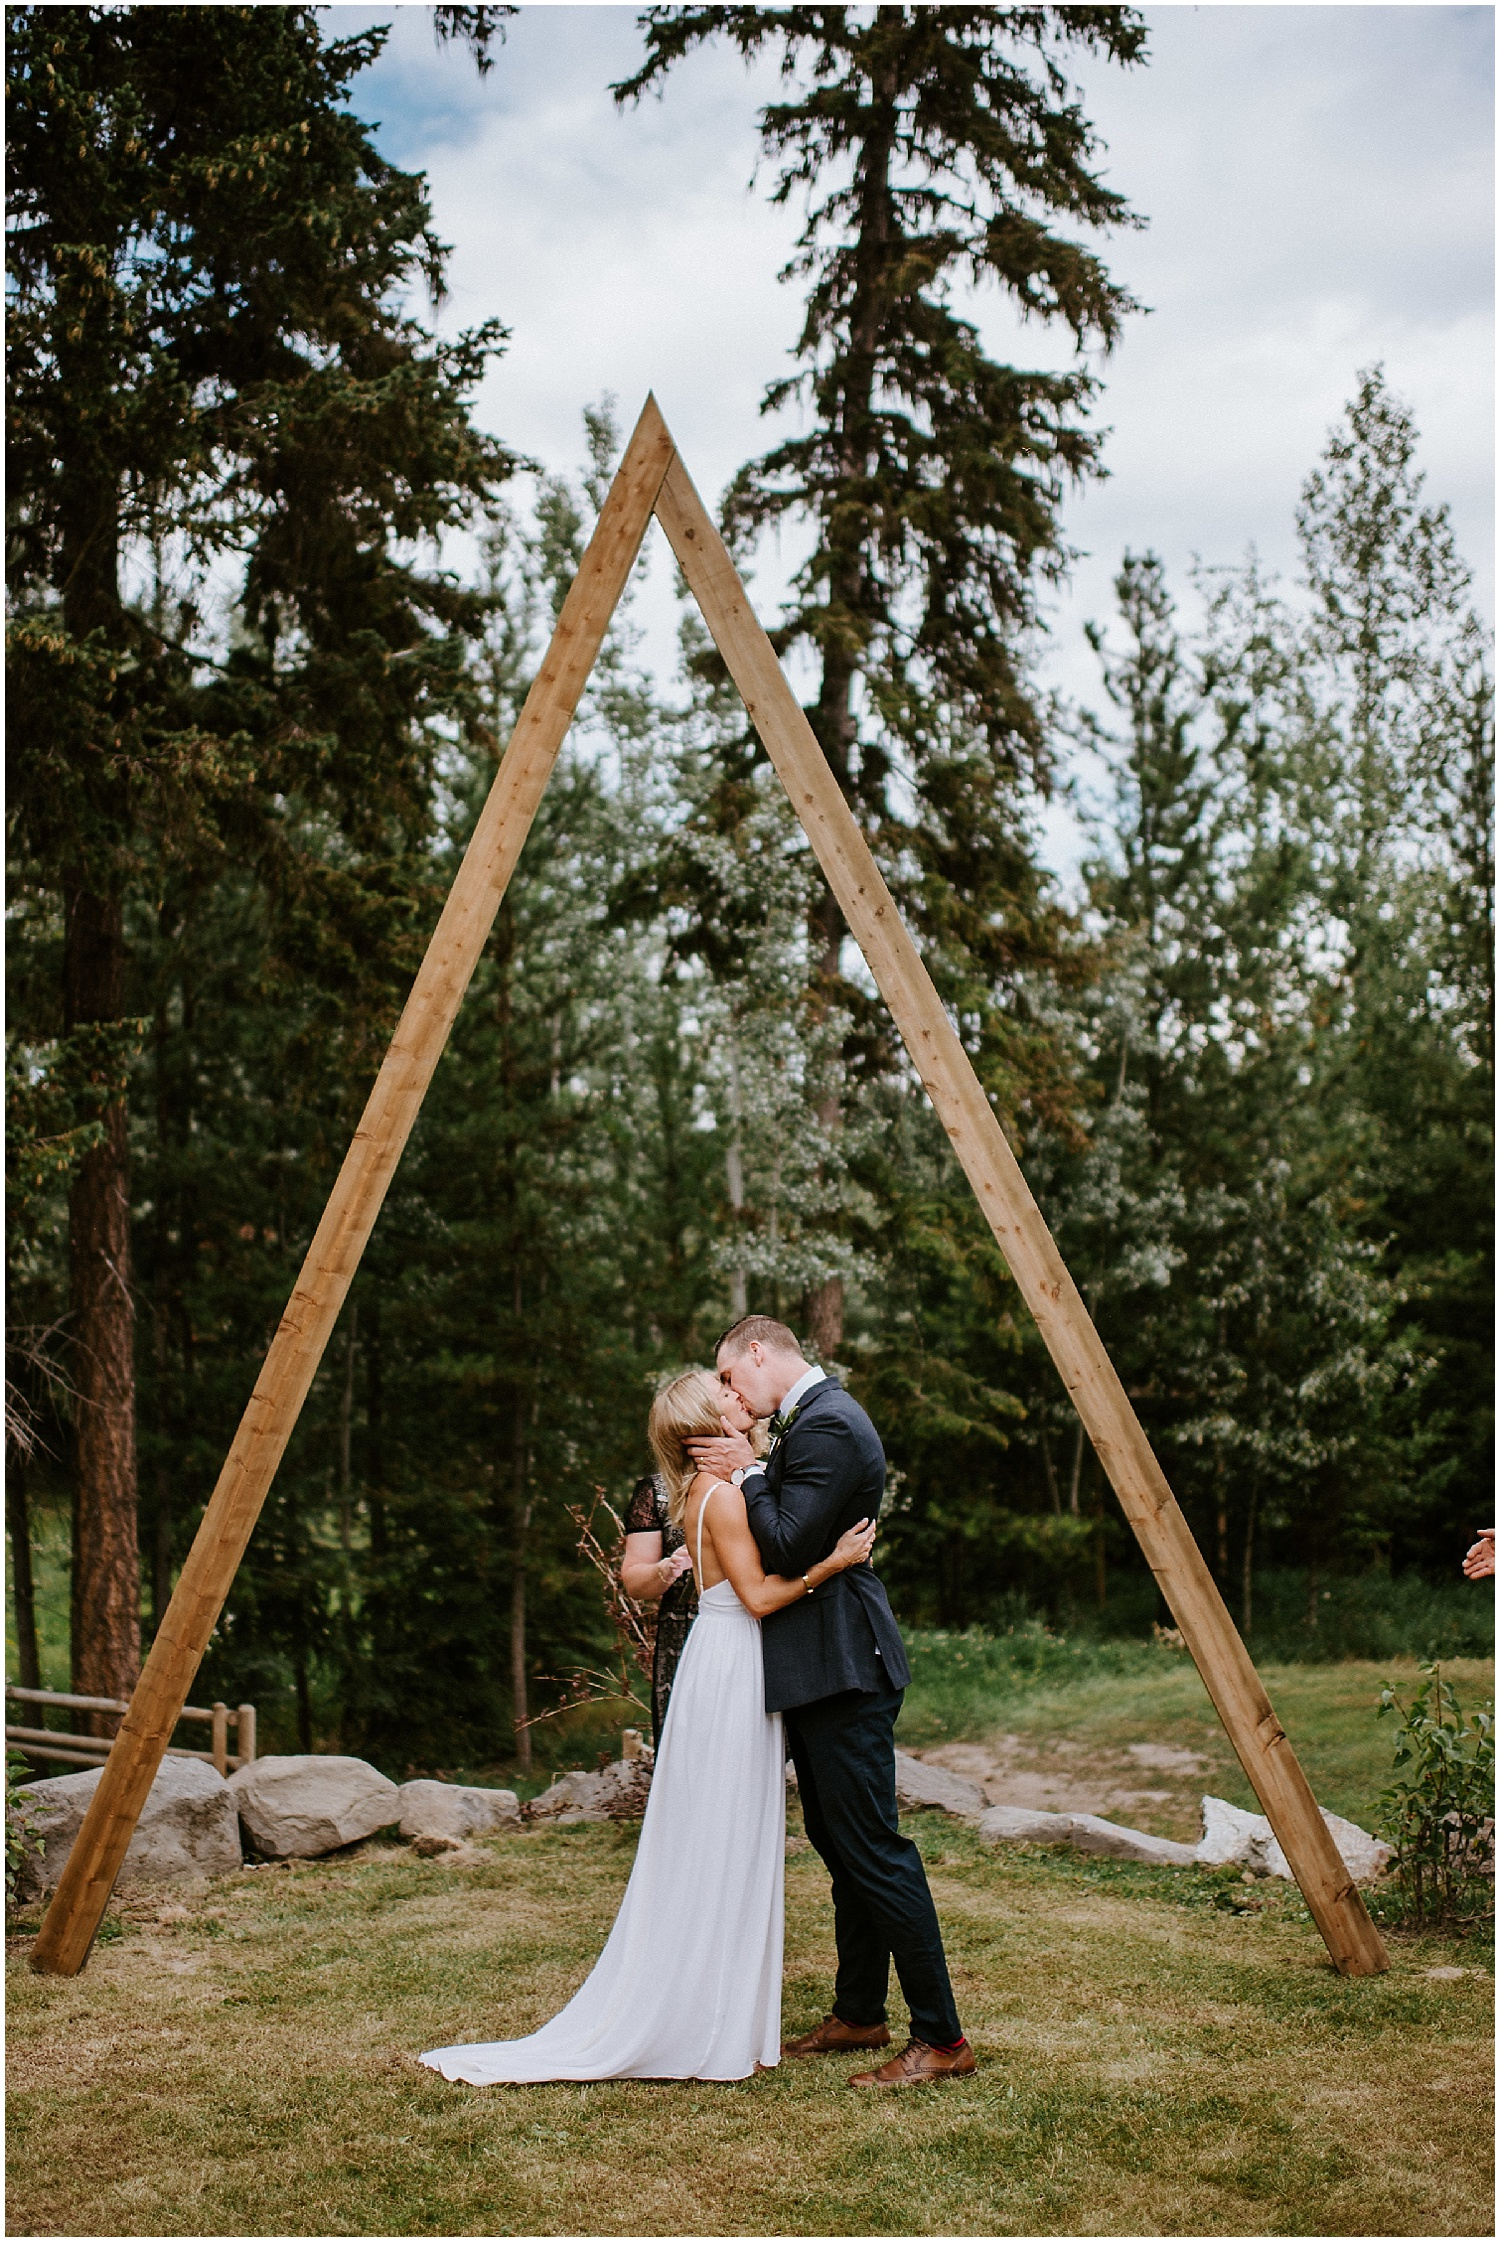 Quesnel_wedding_vancouver_bc_elopement_Pinnacles_Provincial_Park_0189.jpg